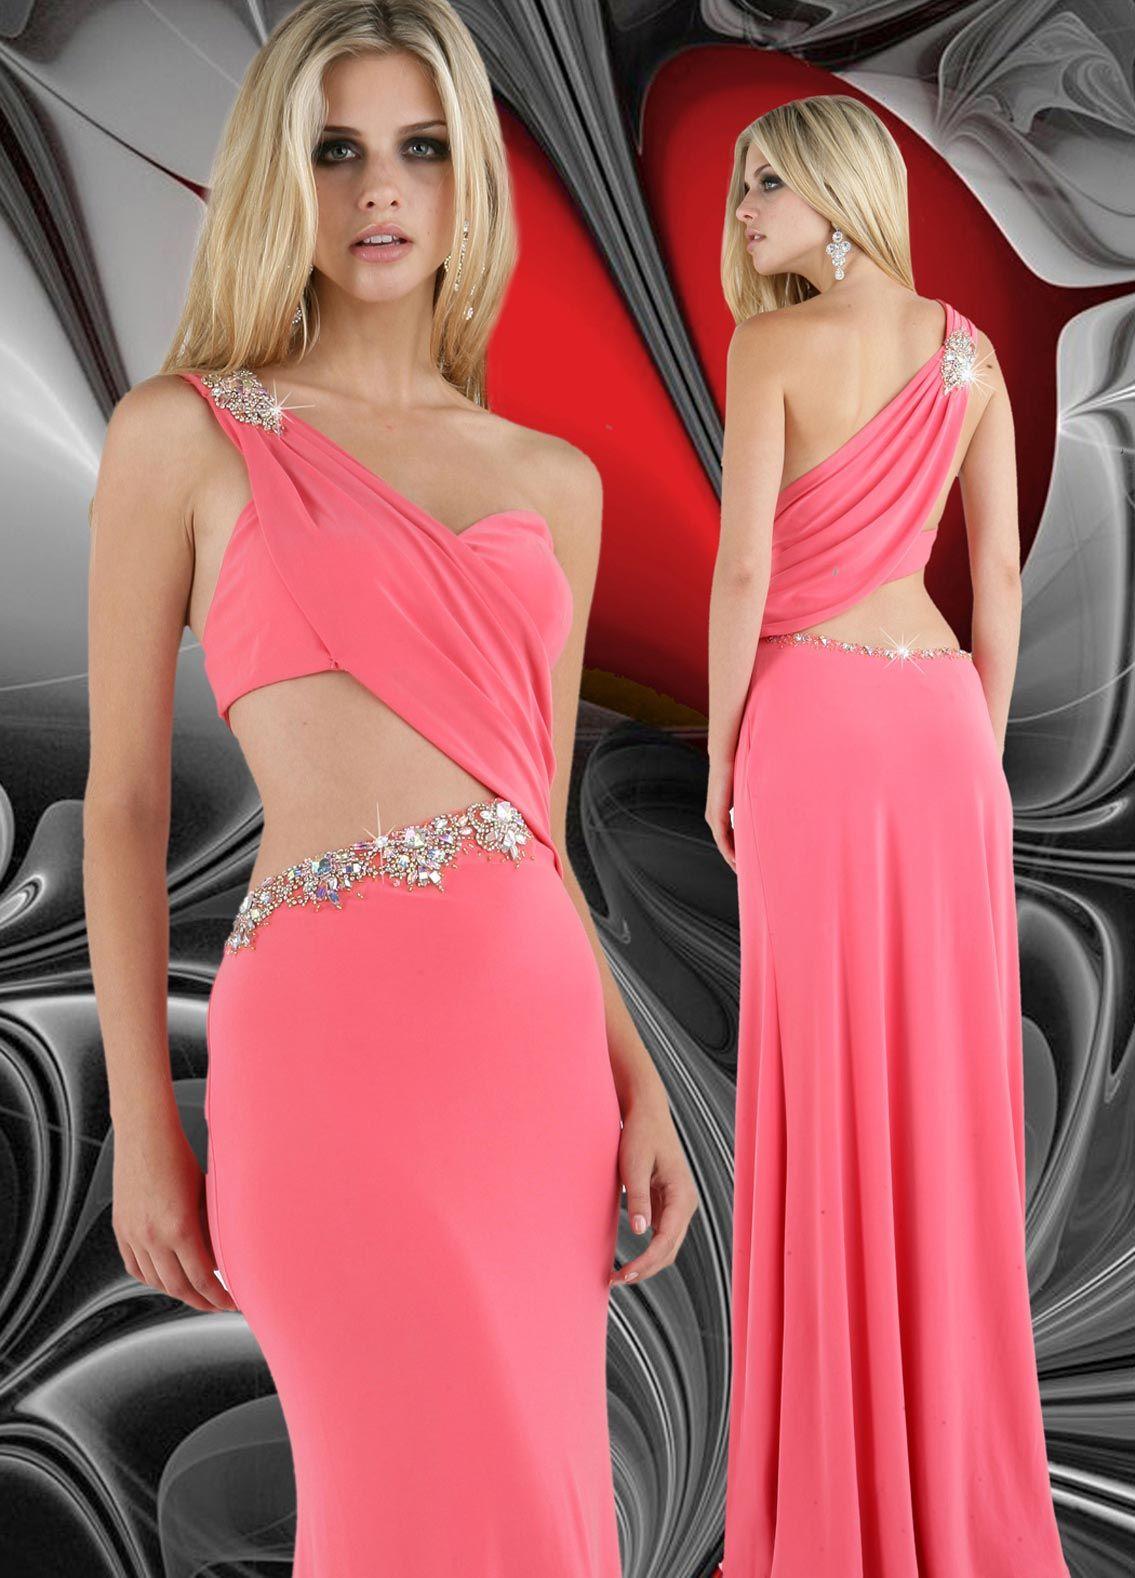 sexy dress design | Sexy dresses | Pinterest | Dress designs and ...